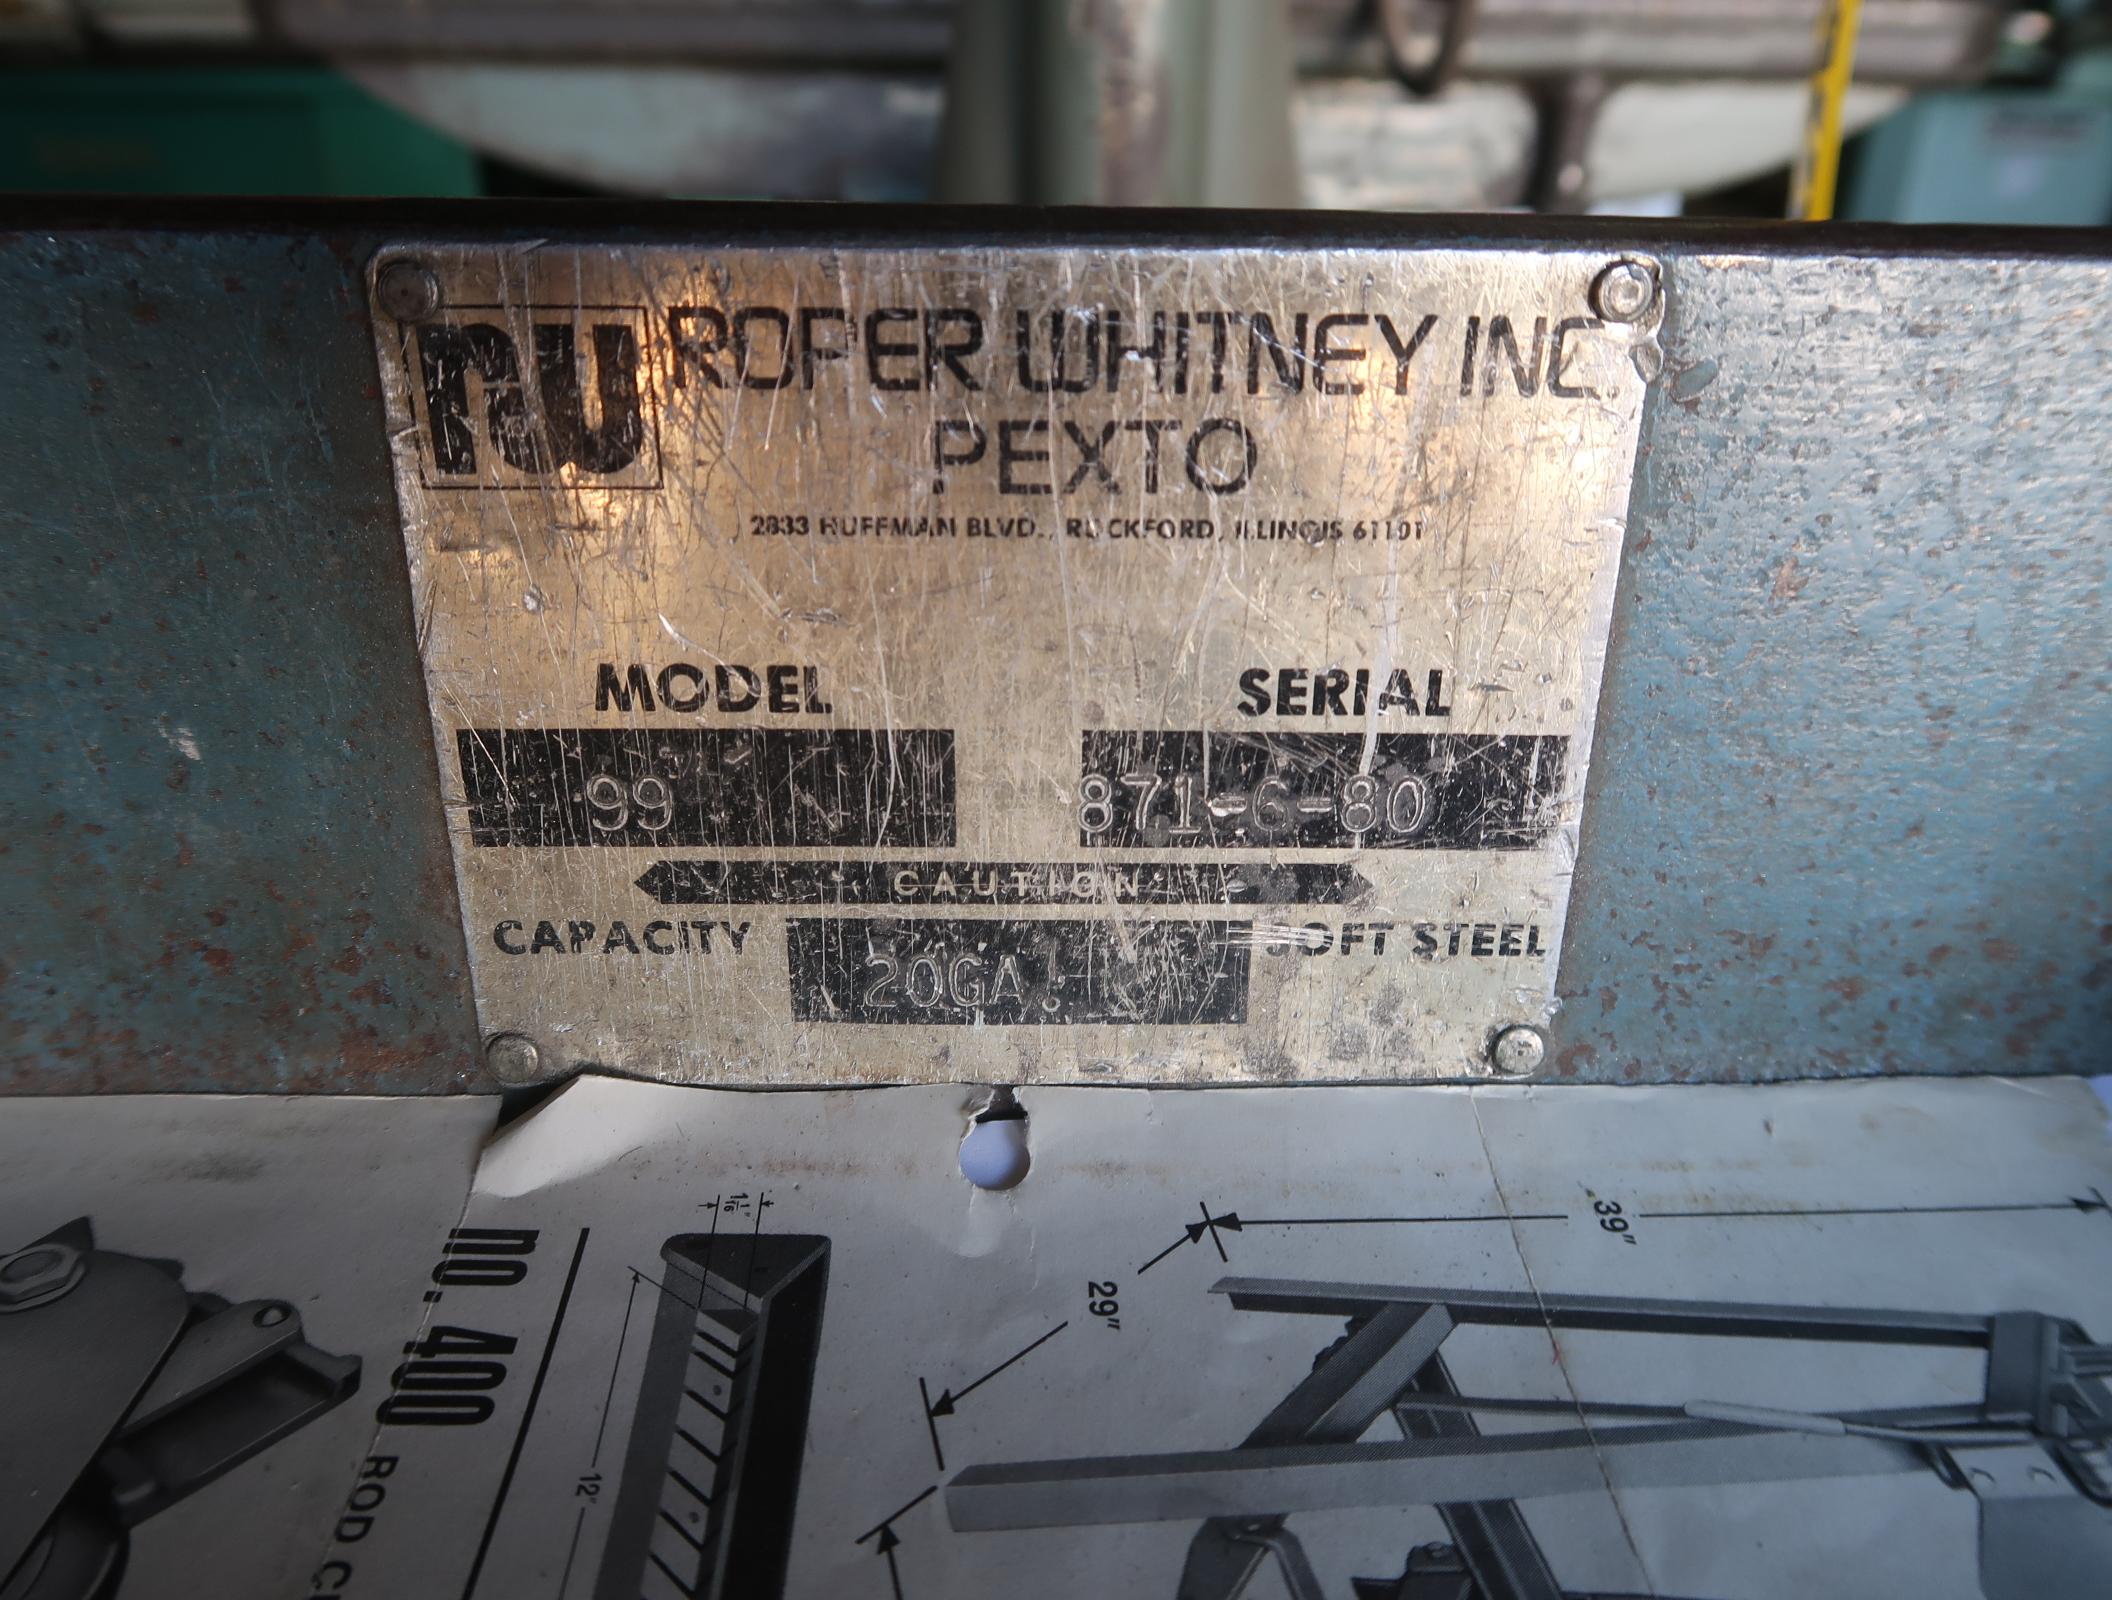 ROPER WHITNEY INC PEXTO NO. 400 ROD CUTTER 99 BRAKE MDL. 99 SN. 871-6-80 - Image 2 of 2